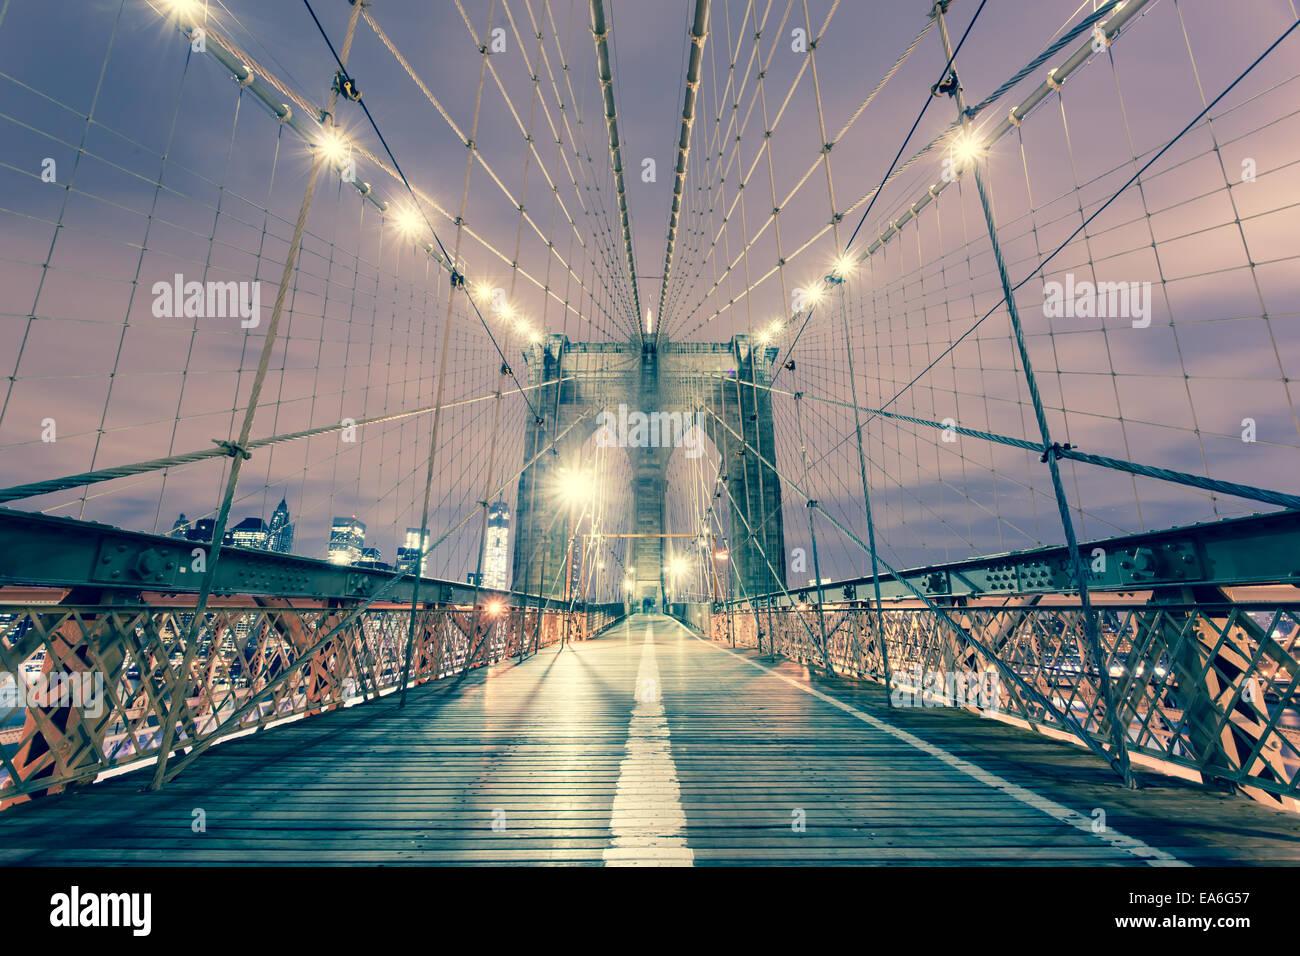 USA, New York State, New York City, View of Brooklyn Bridge - Stock Image